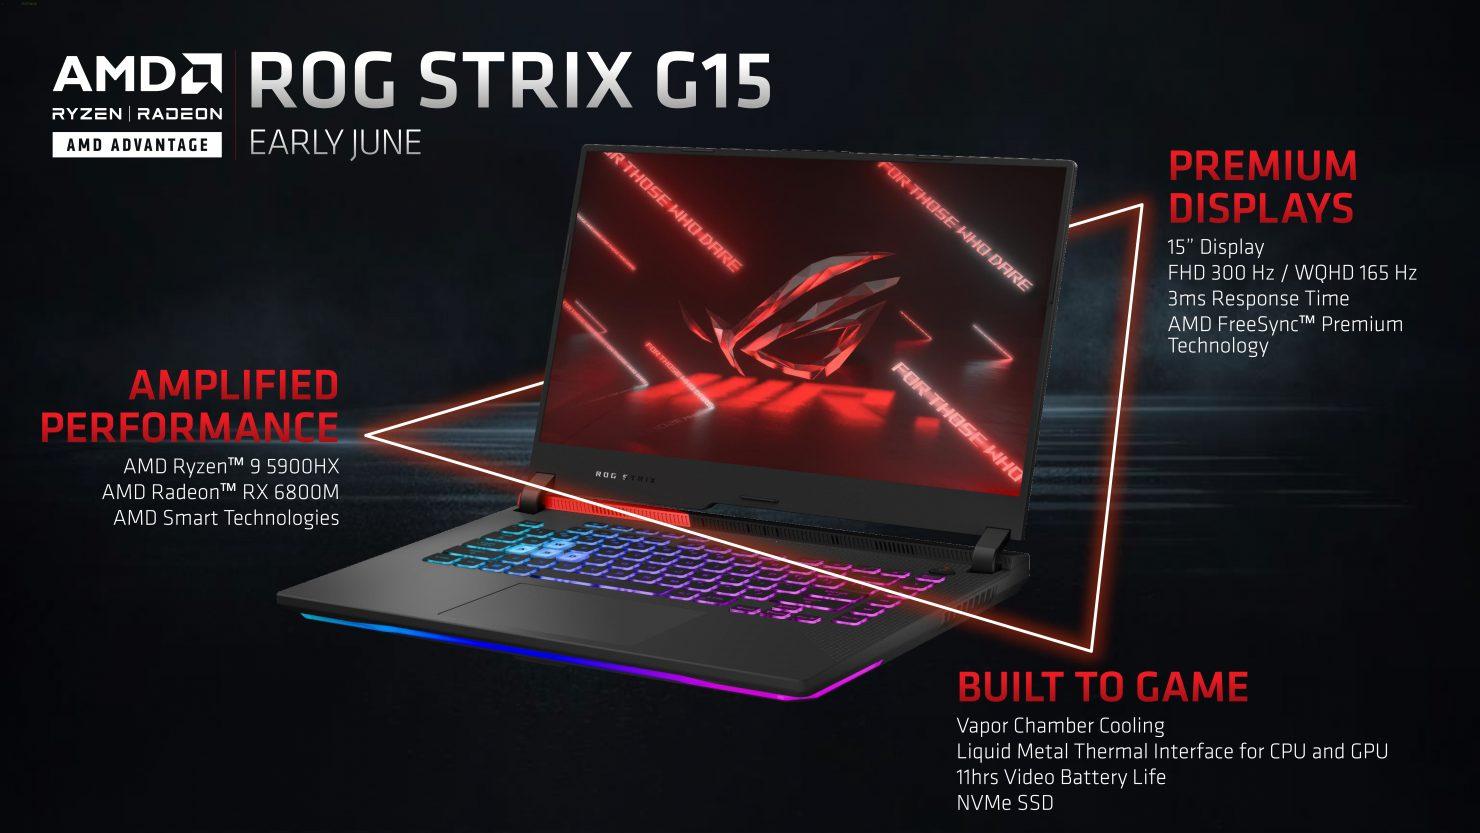 asus-rog-strix-g15-amd-advantage-laptop-with-ryzen-9-5900hx-&-radeon-rx-6800m-is-the-best-selling-gaming-laptop-on-bestbuy